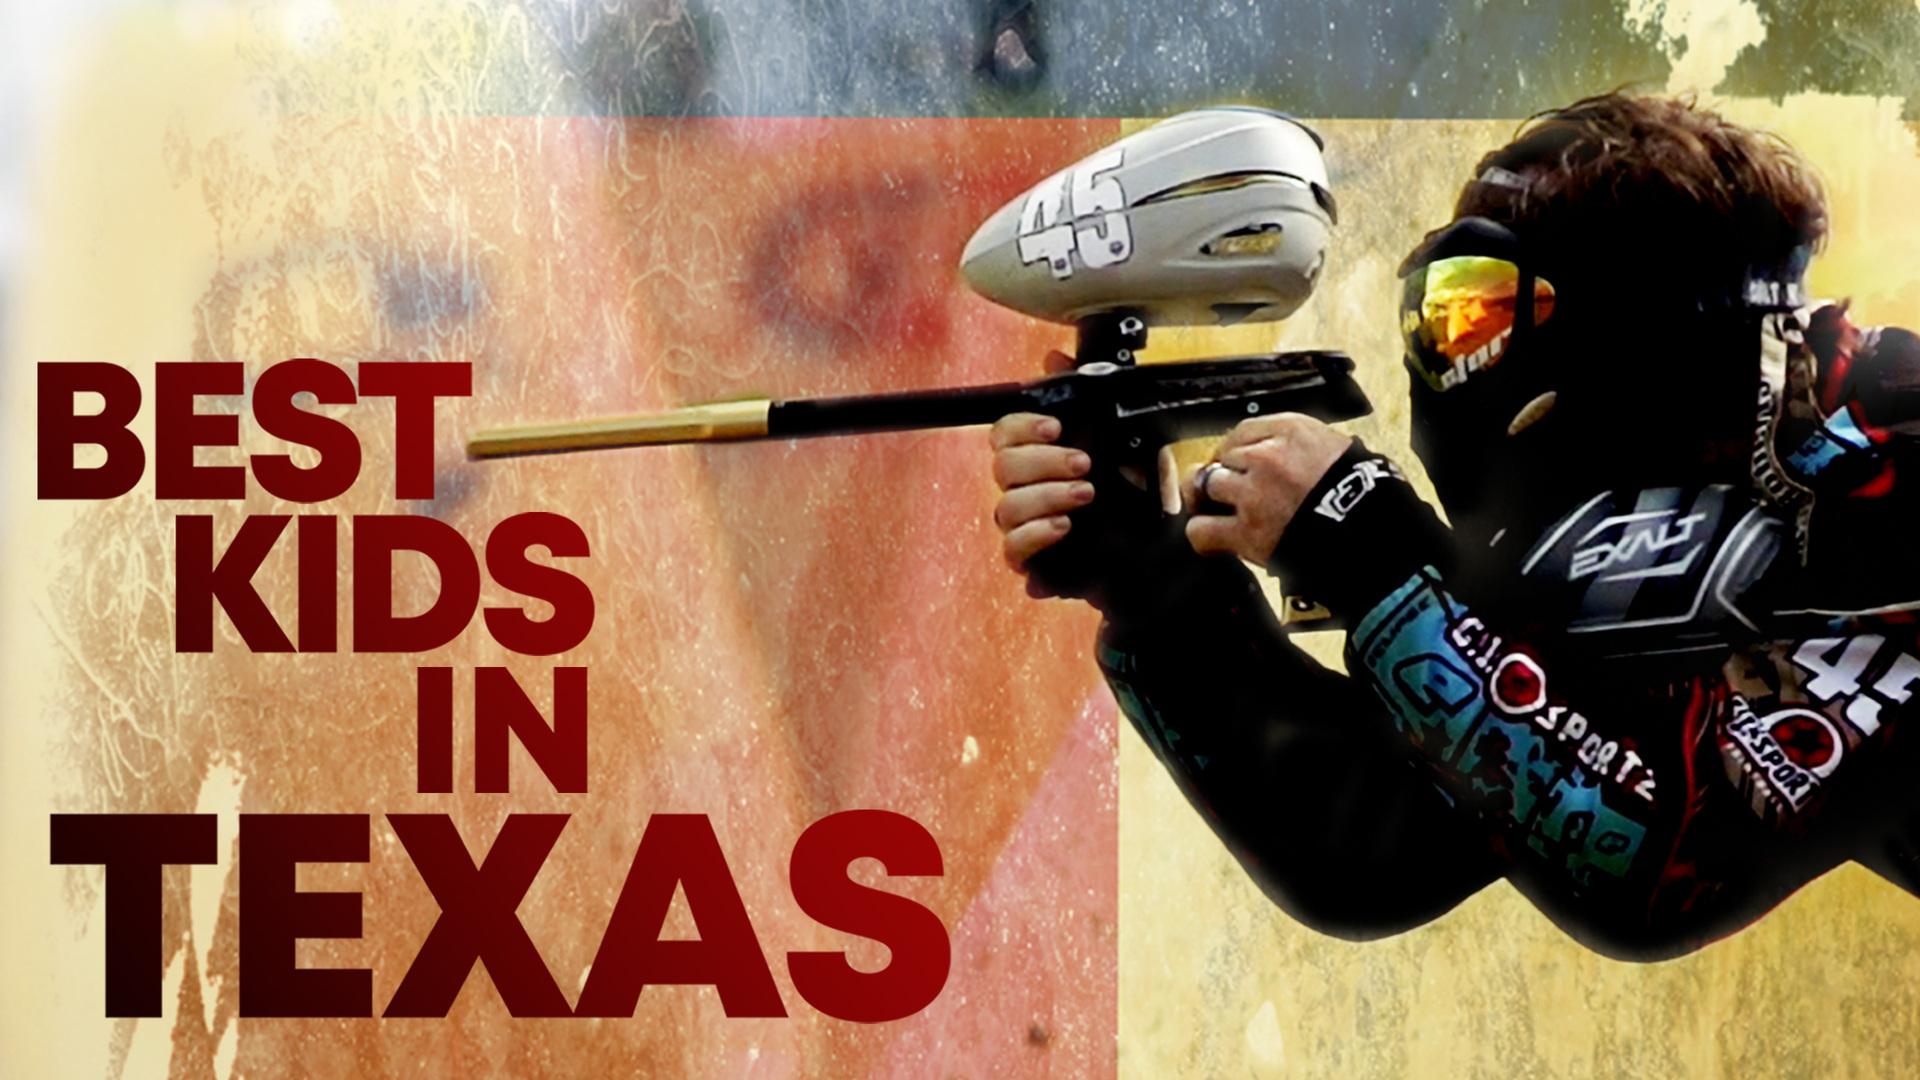 Best Kids In Texas